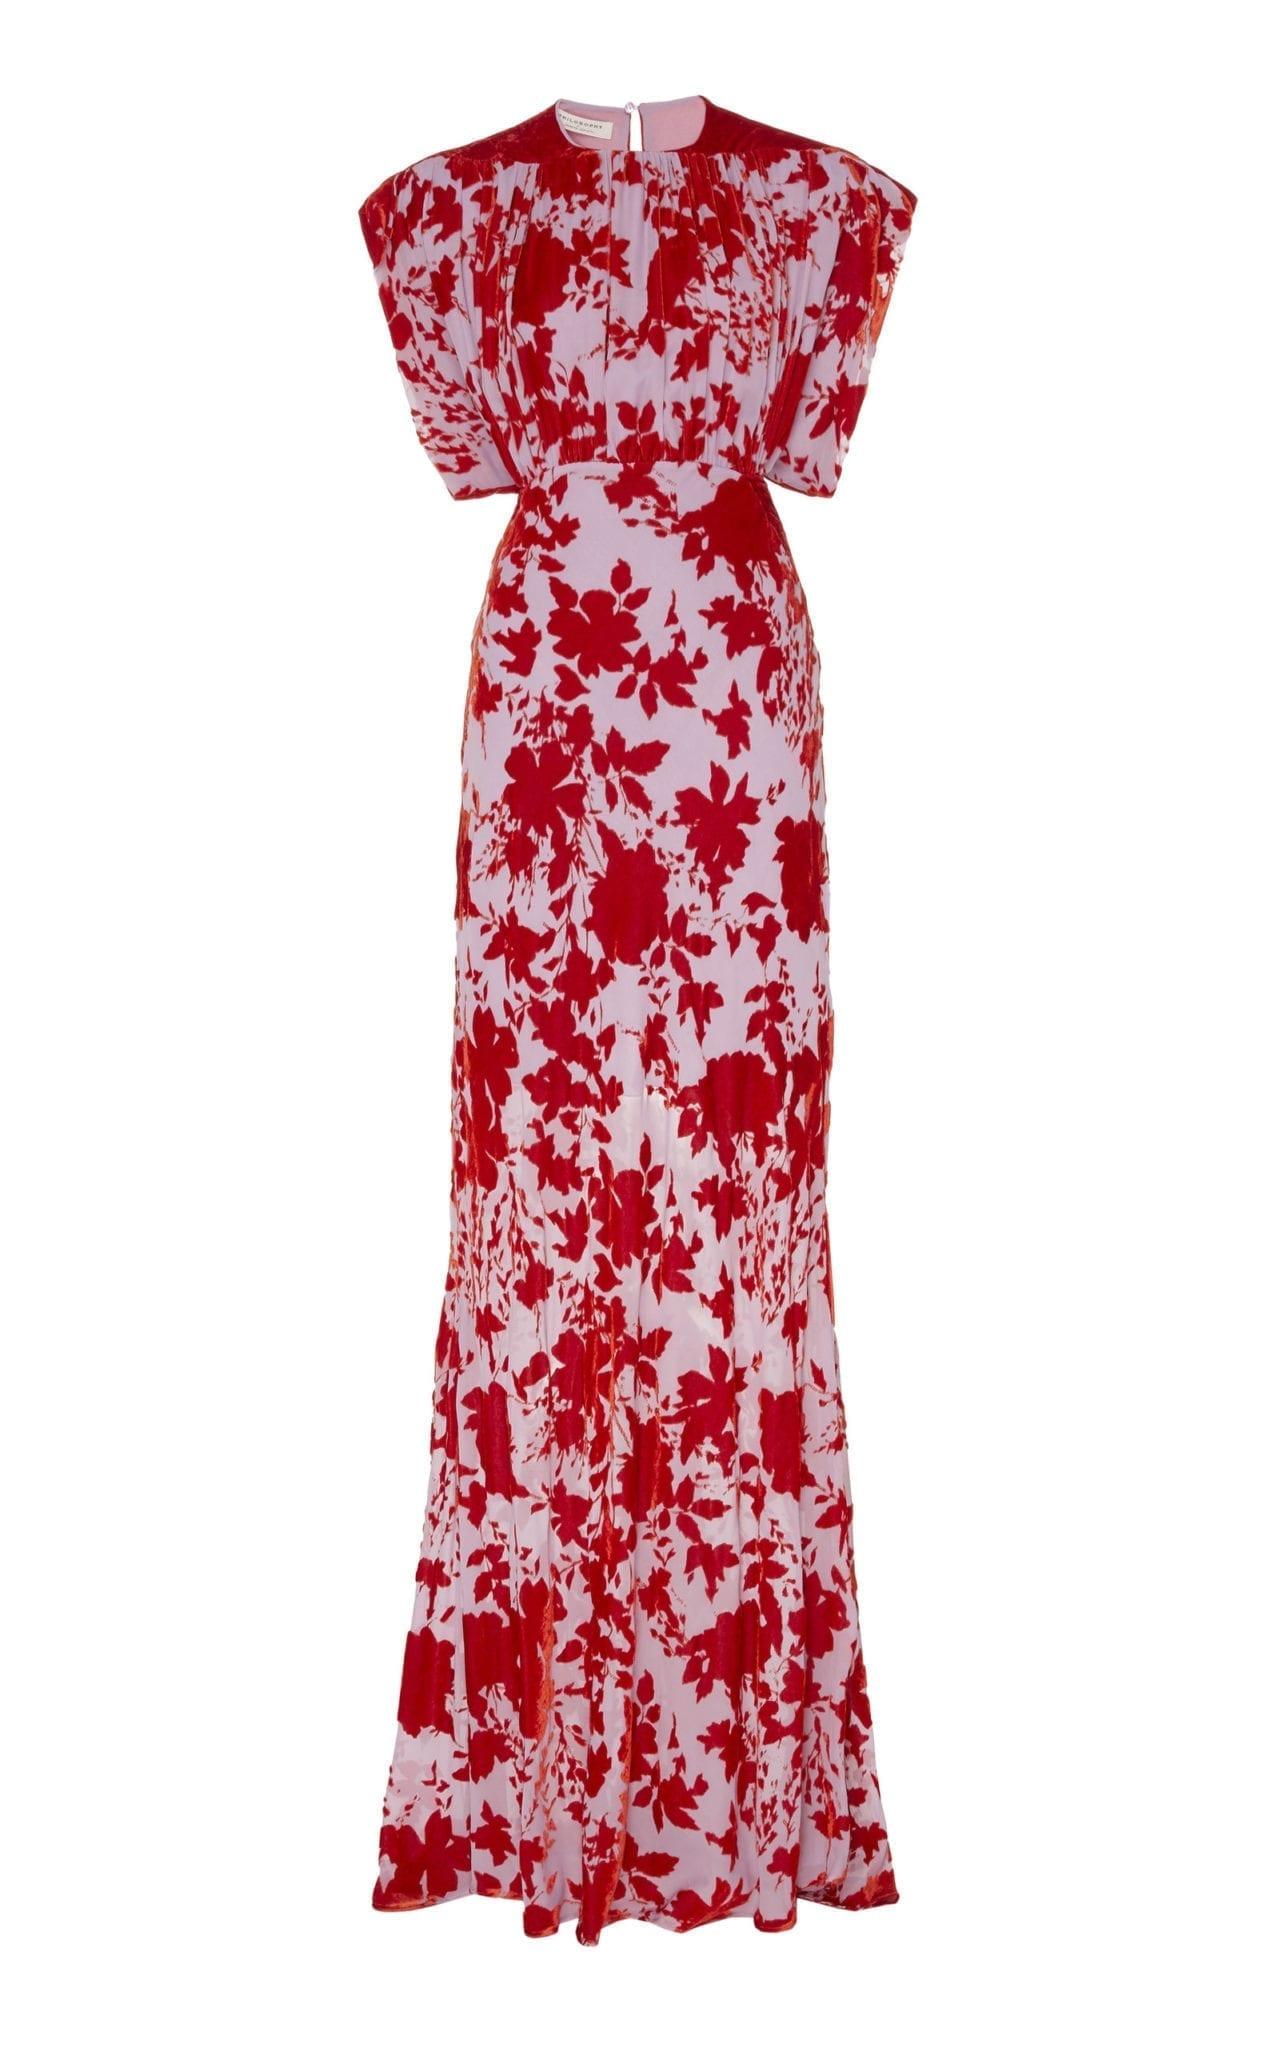 PHILOSOPHY DI LORENZO SERAFINI Floral-Print Devoré Velvet Gown